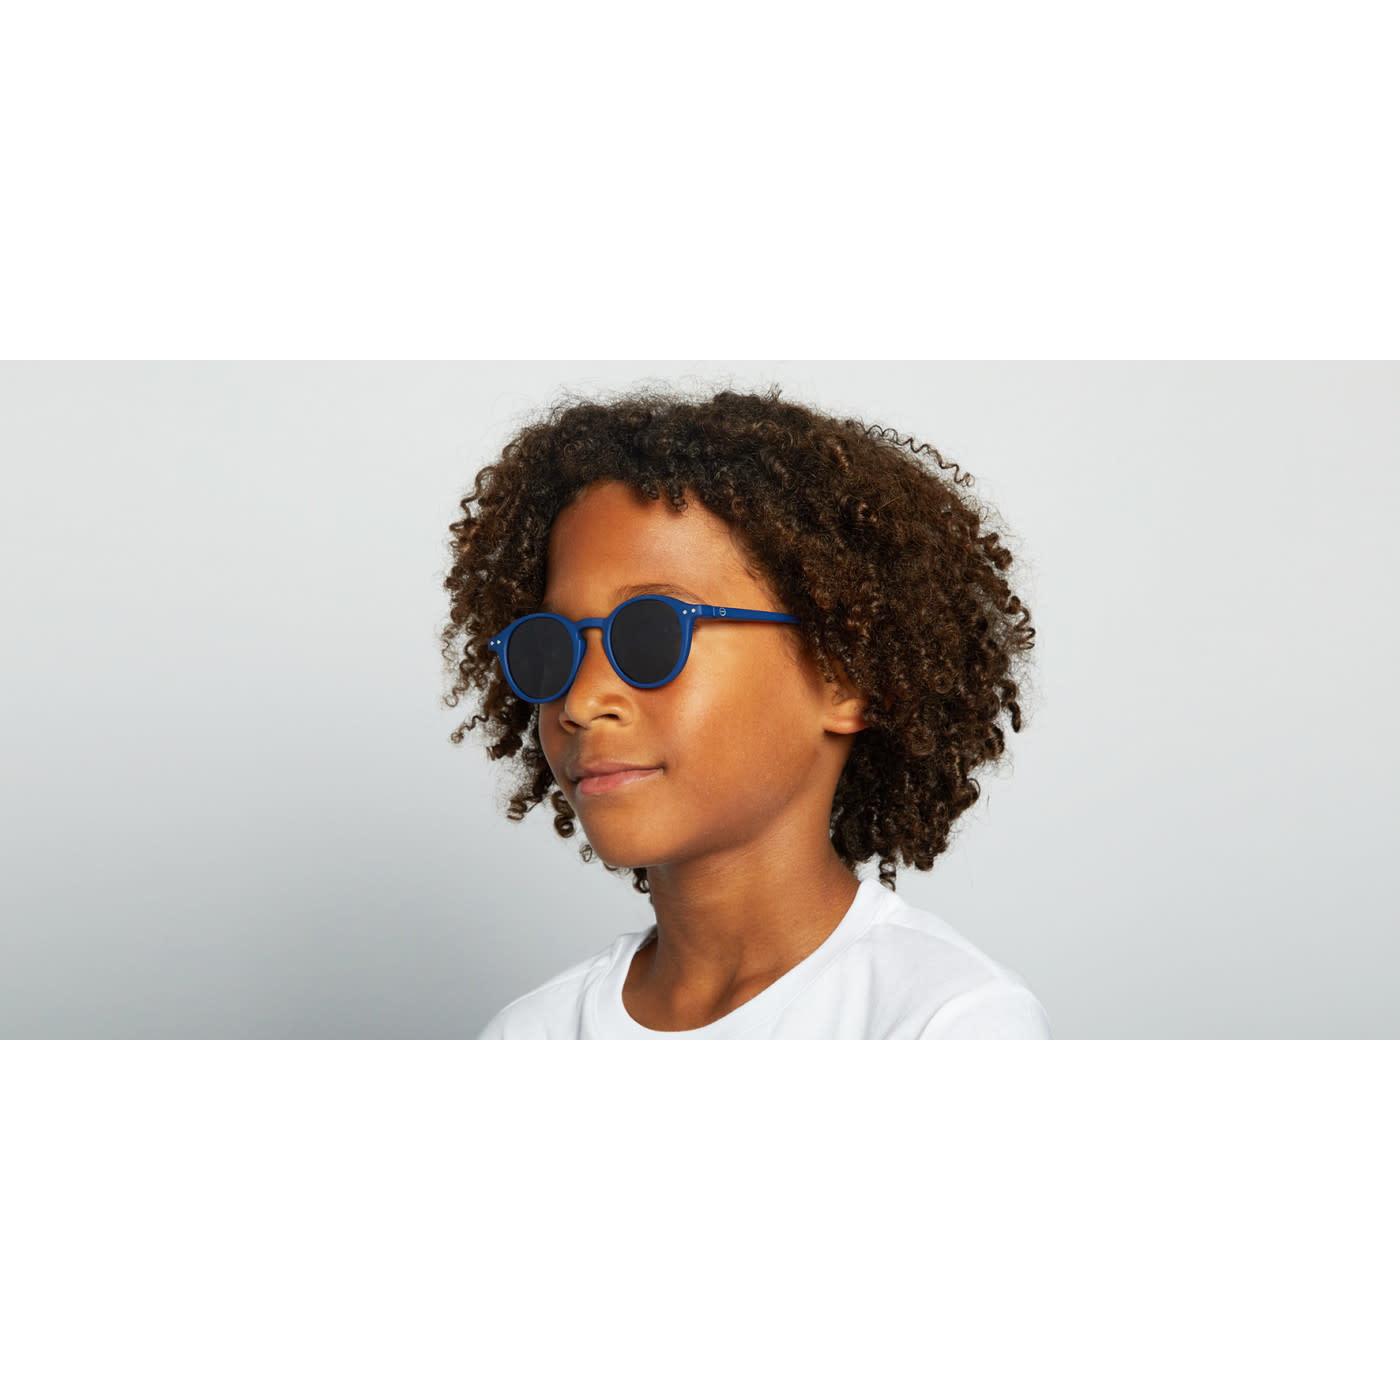 Izipizi Izipizi junior sun navy blue  #D 3-10 years